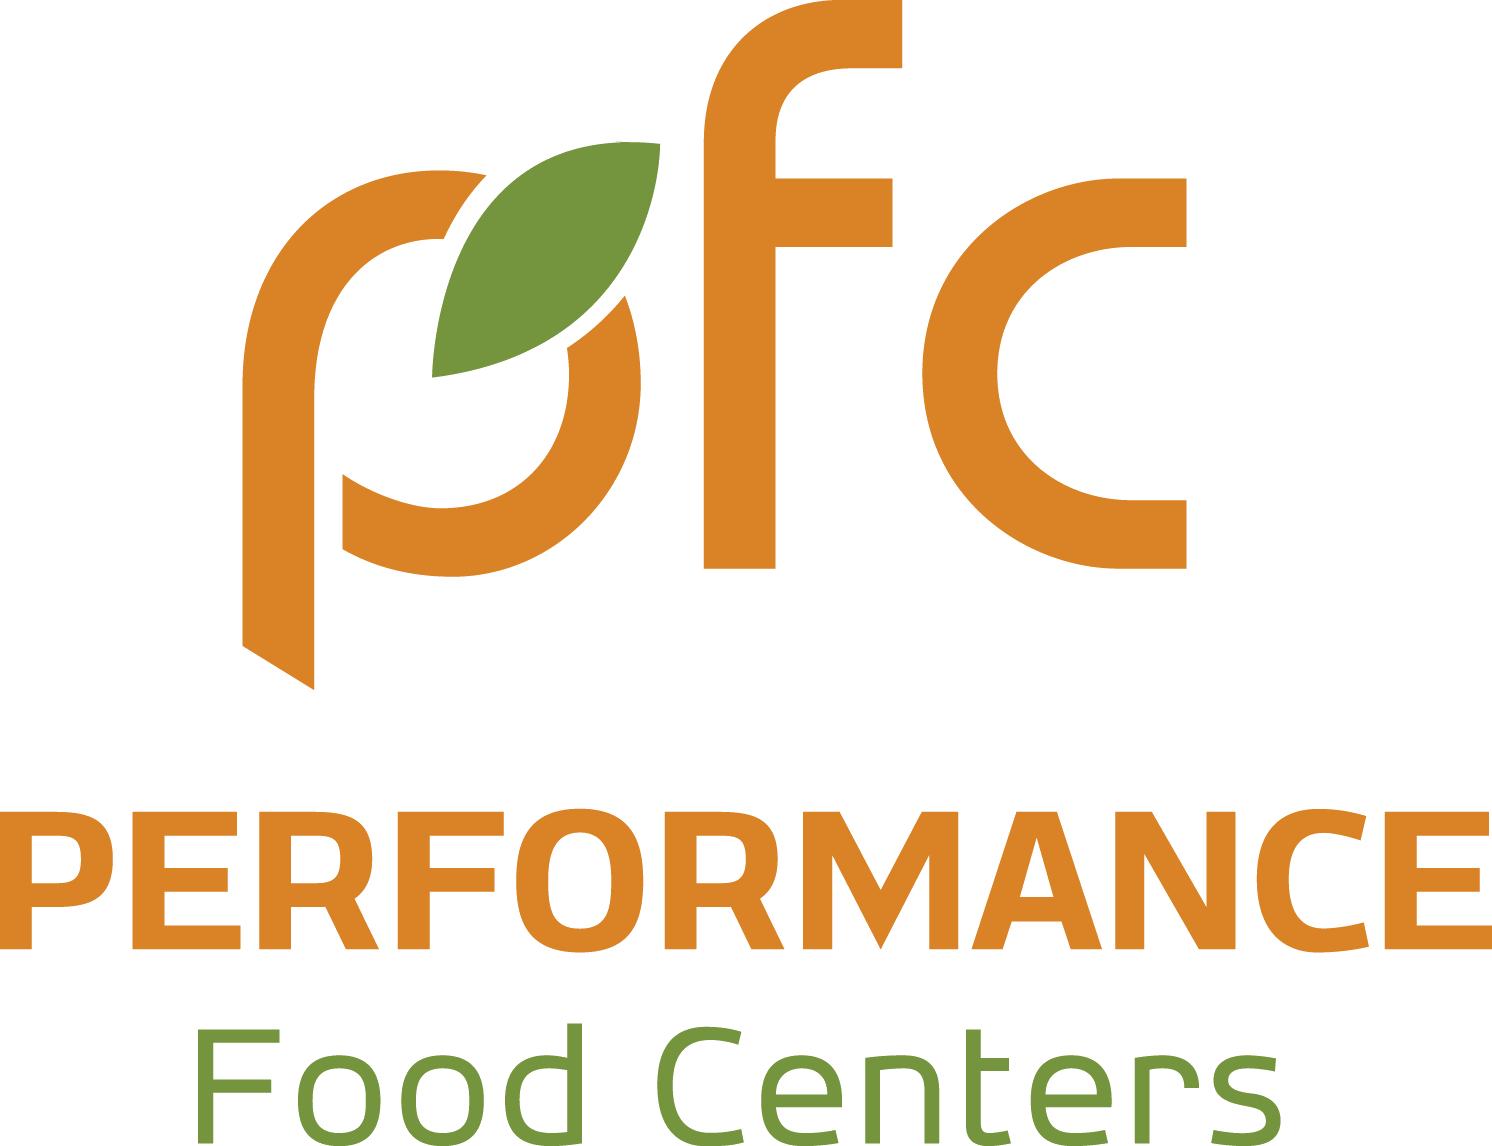 Performance Food Centers logo